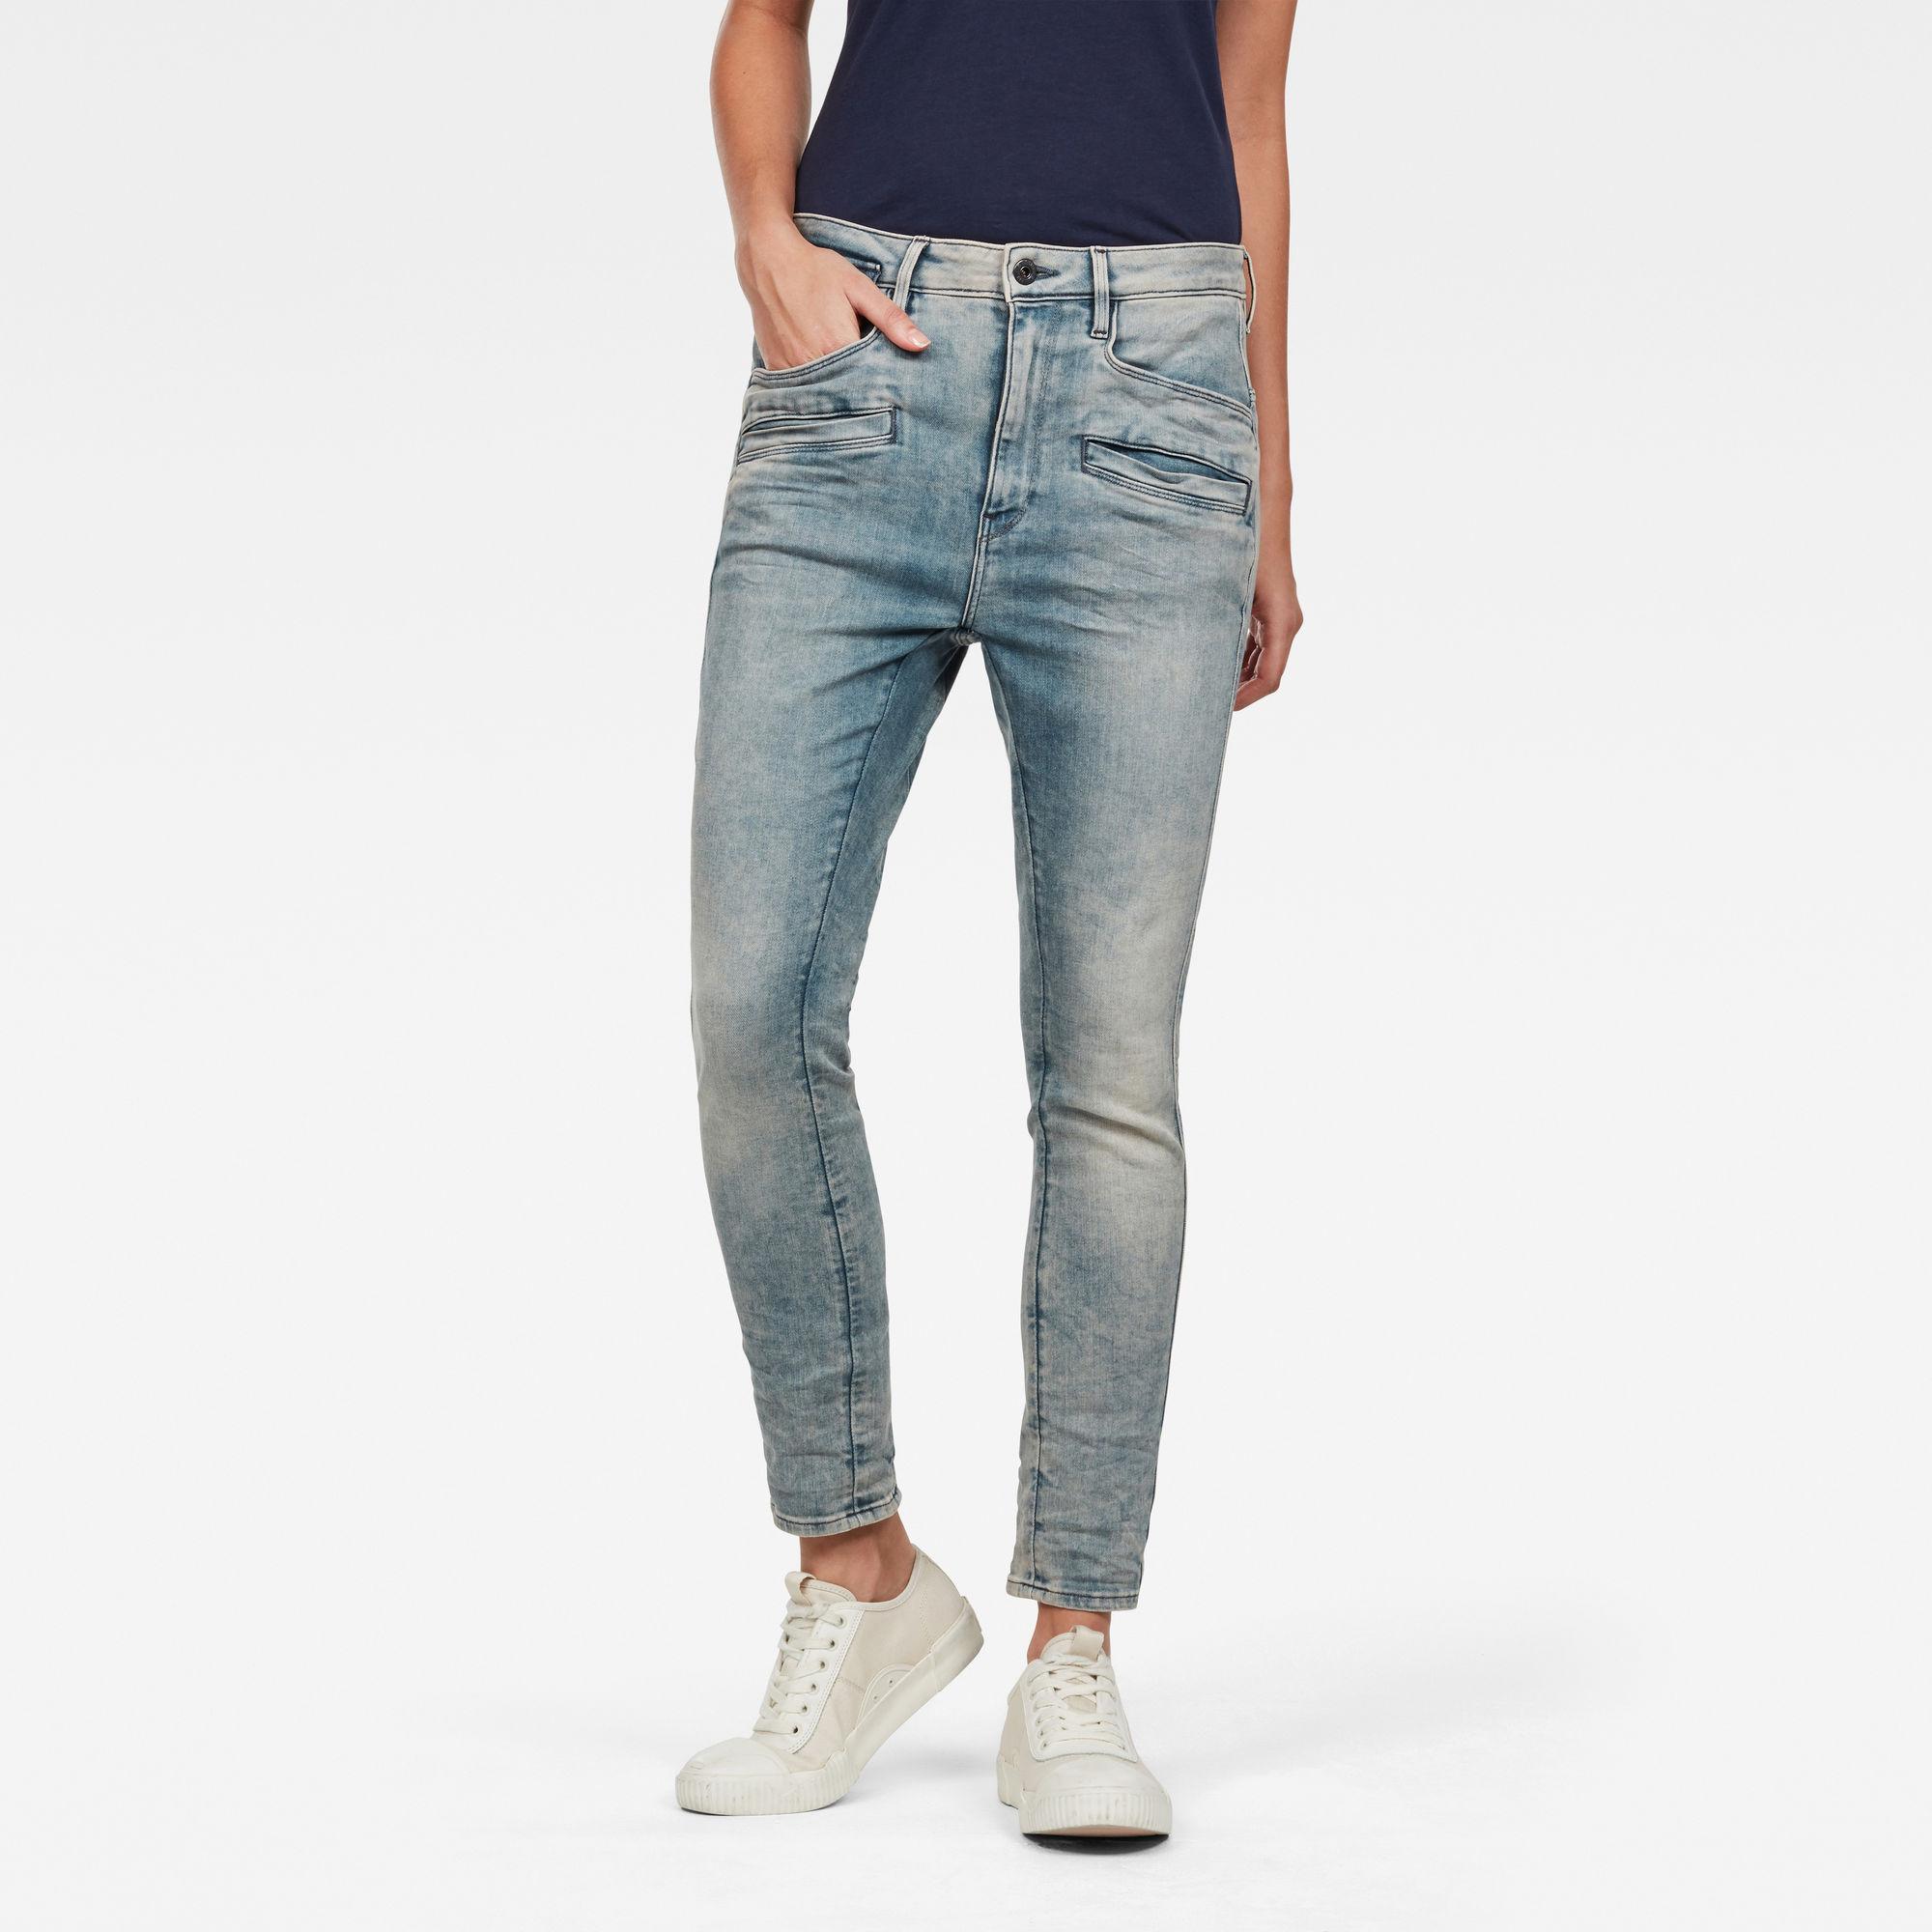 Image of G Star Raw Dadin 3D Low Boyfriend Jeans